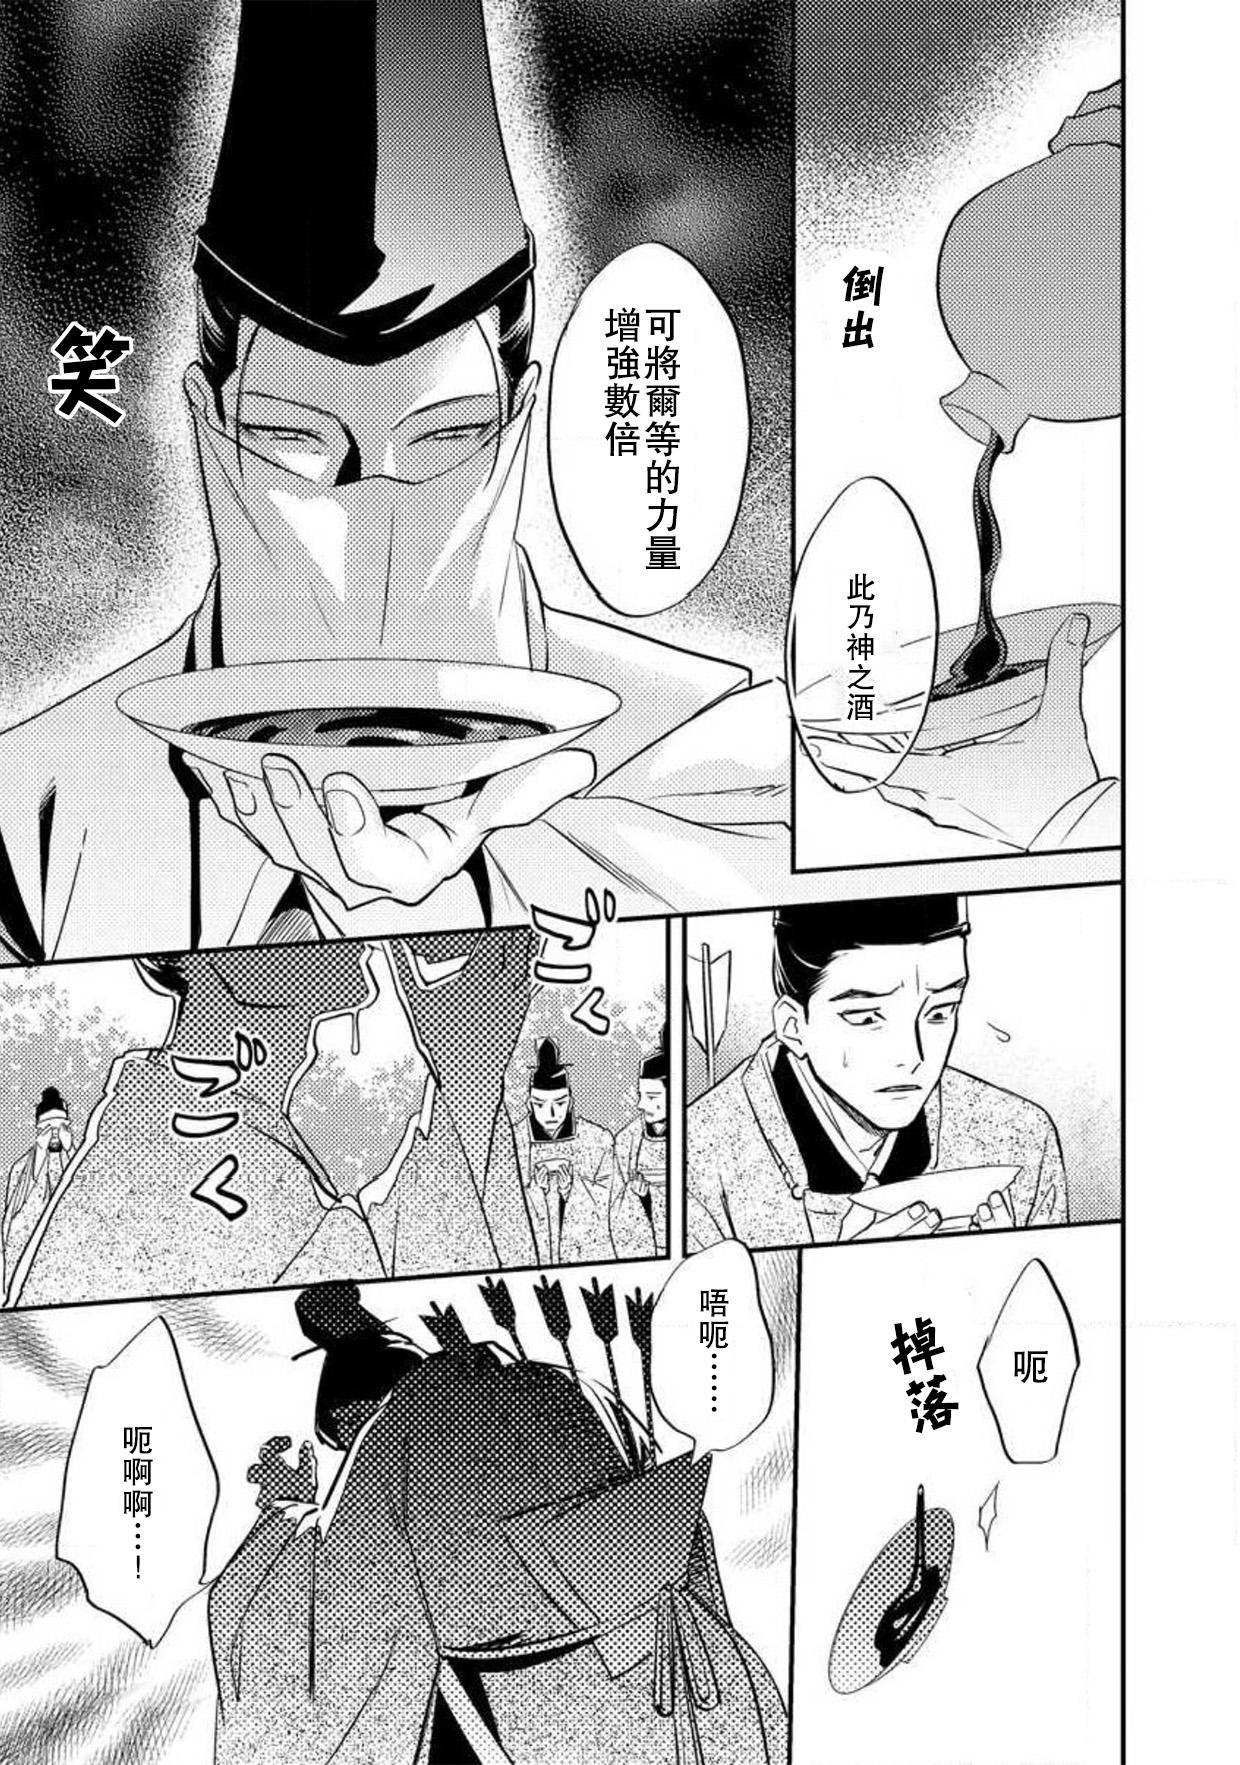 Oeyama suimutan utsukushiki oni no toraware hime | 大江山醉夢逸話 美麗的鬼與被囚禁的公主 Ch. 1-8 204